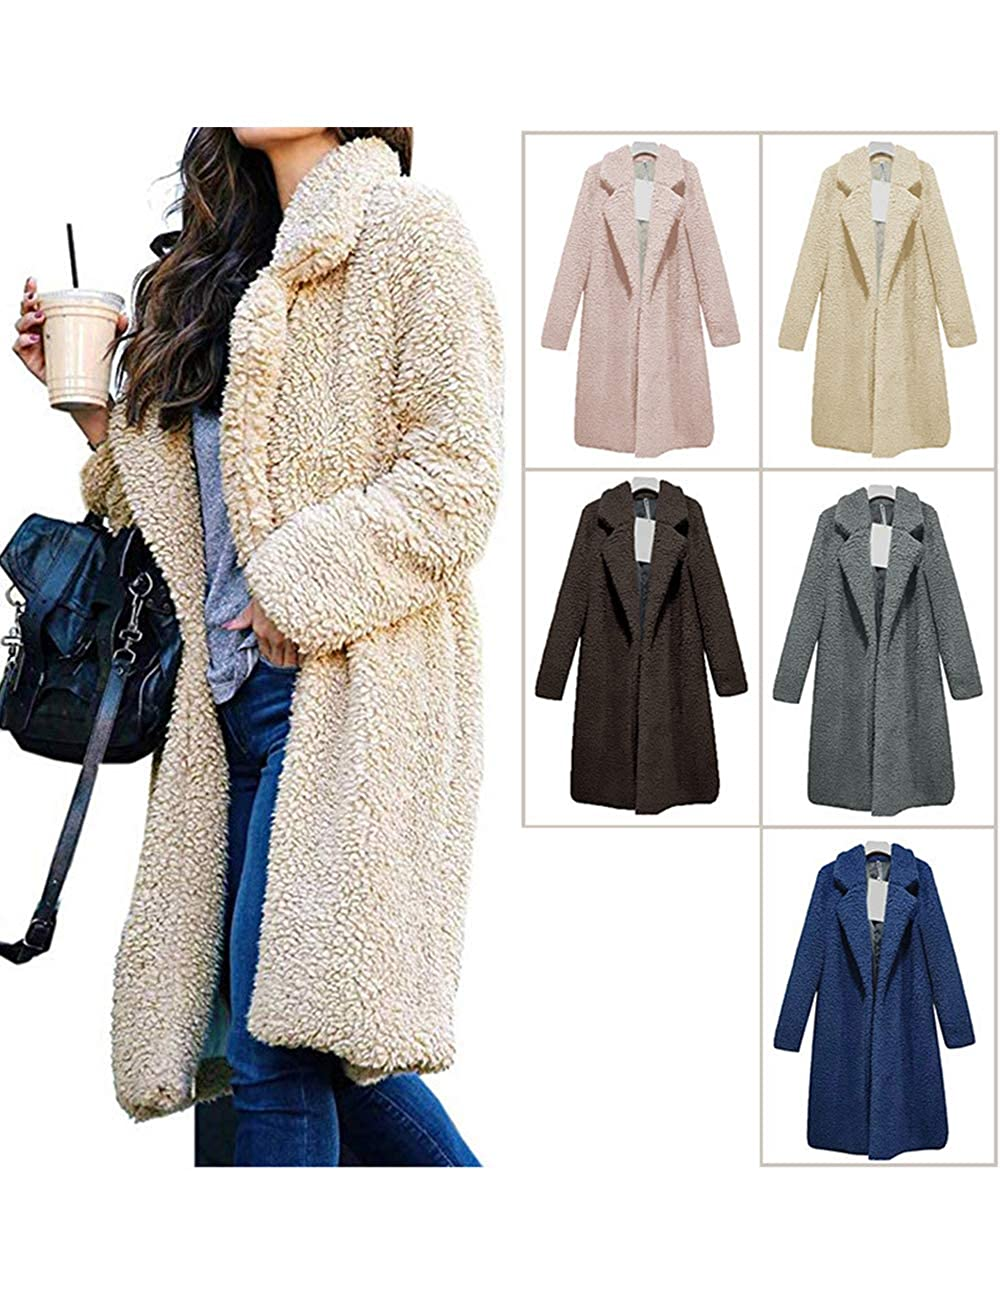 Amazon.com: BESBOMIG Fuzzy Cardigan Shaggy Jacket - Chaqueta ...